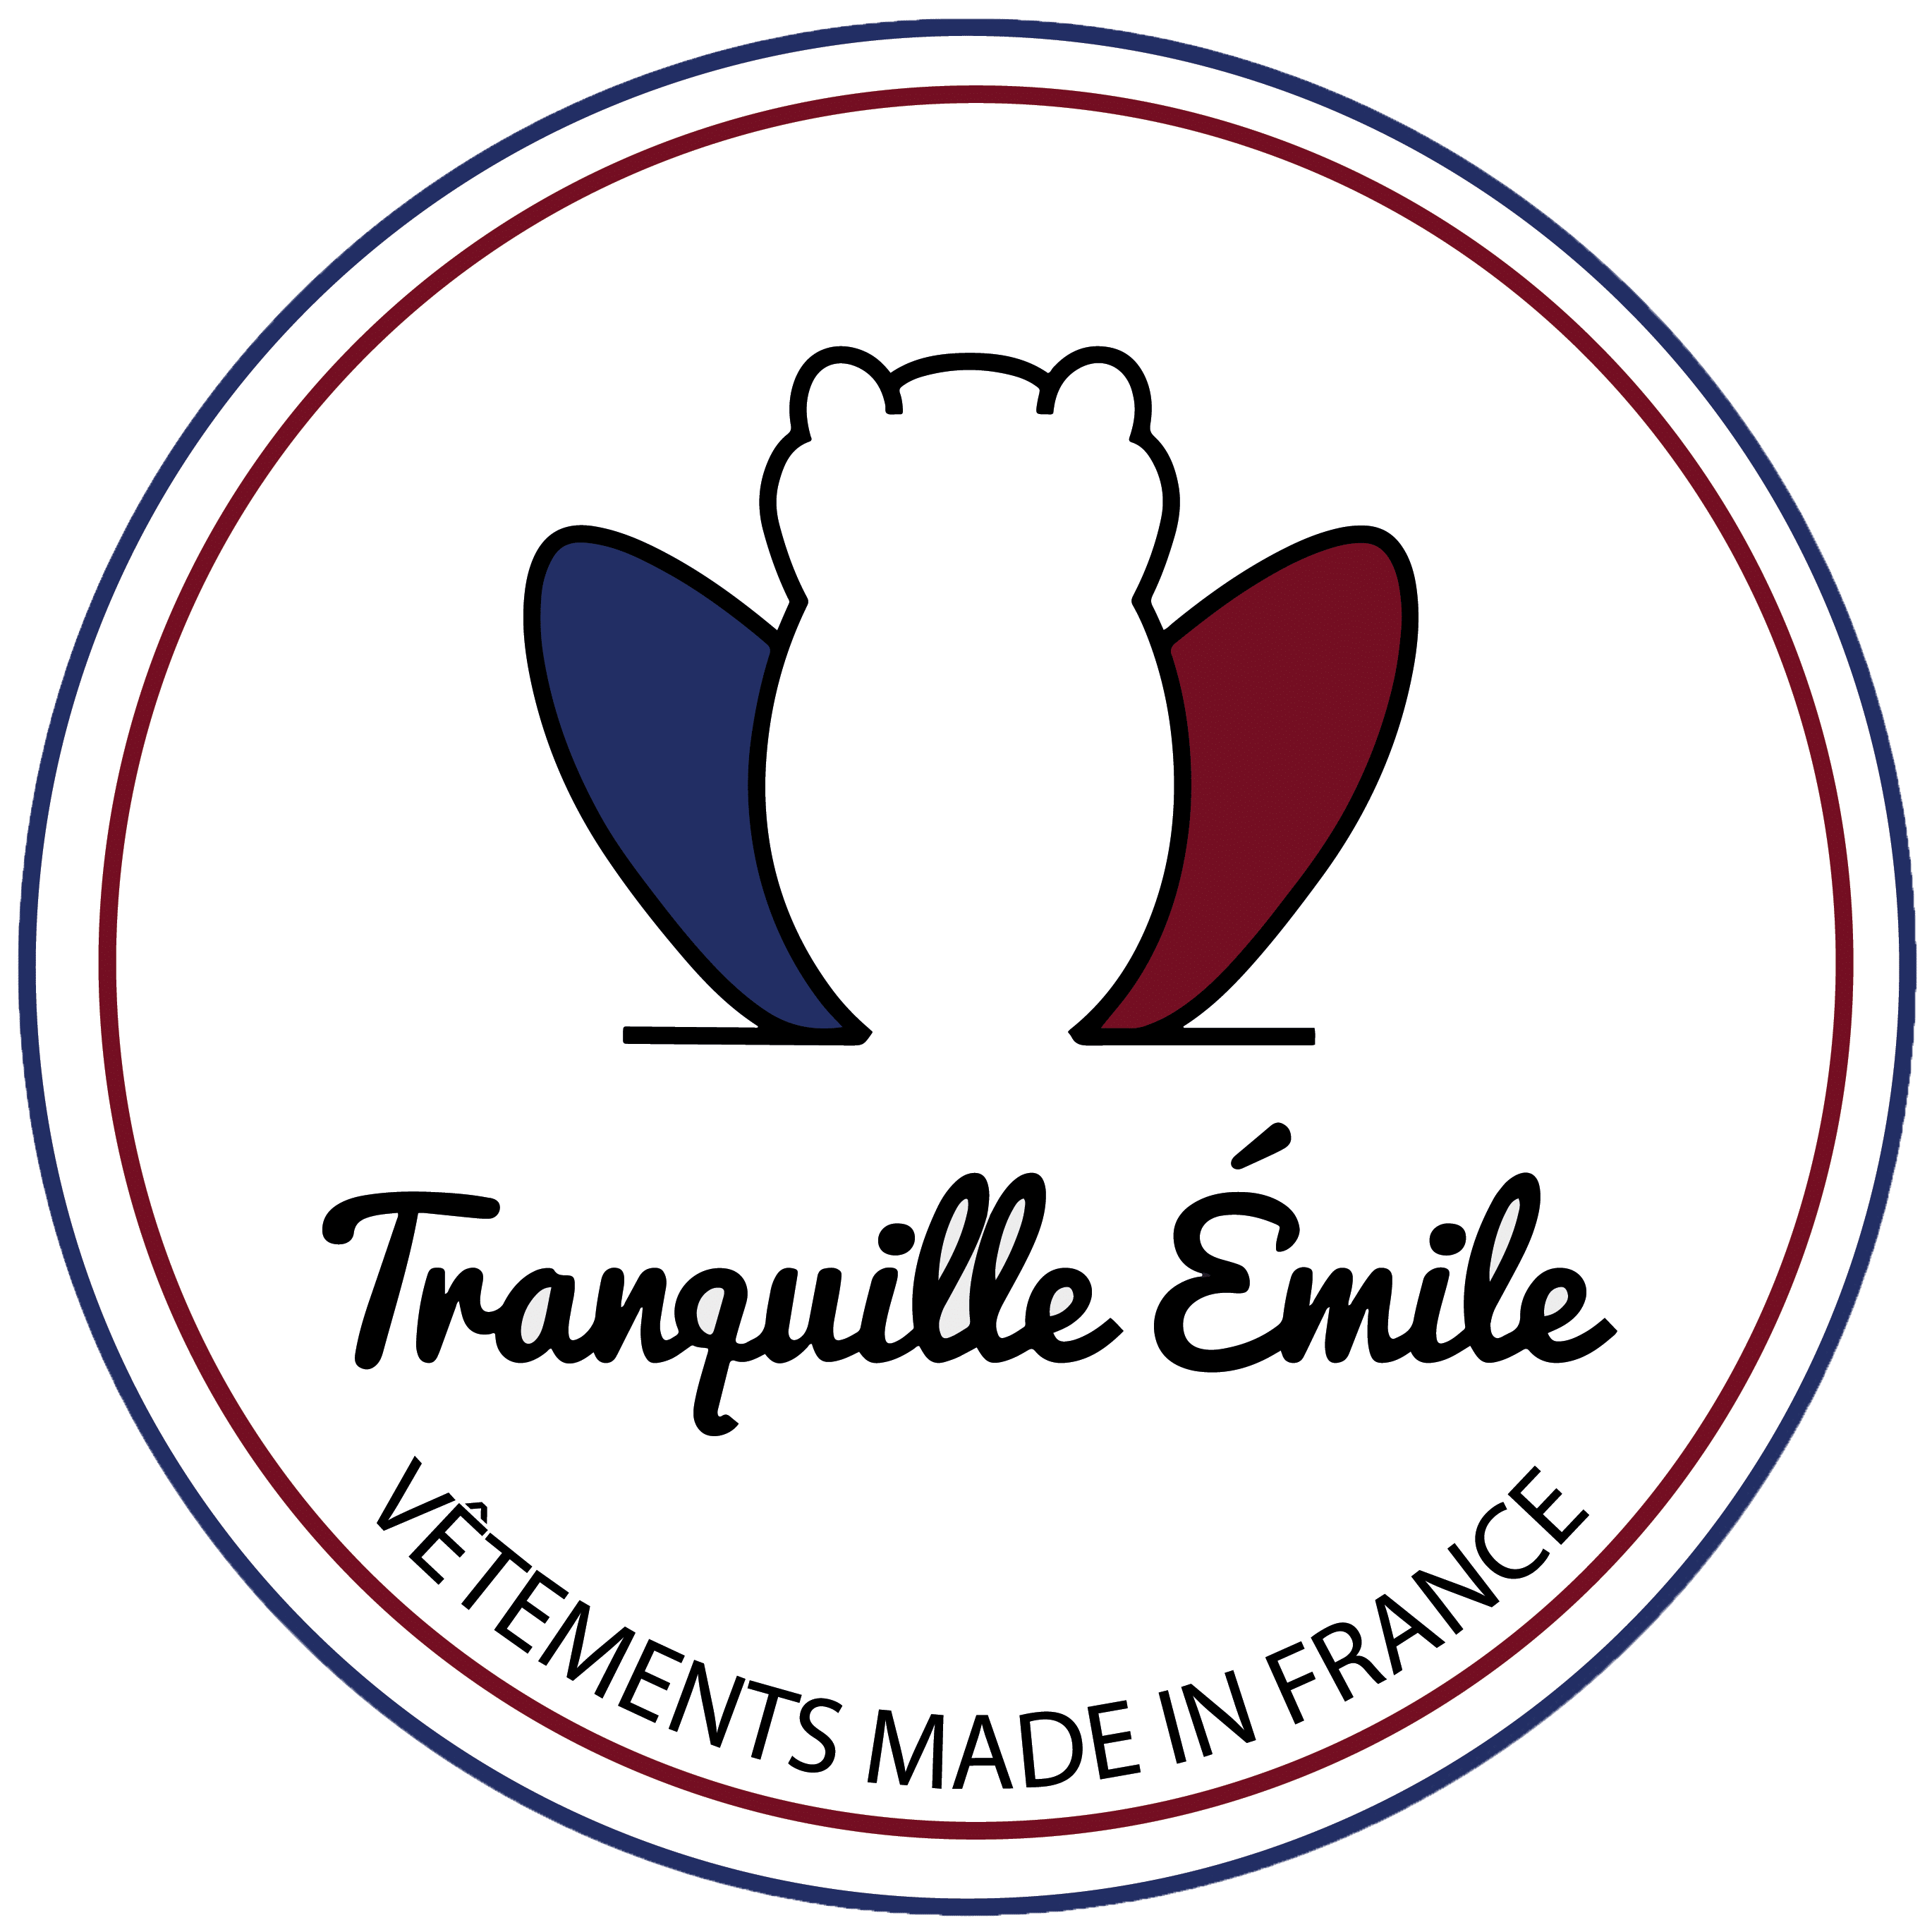 Logo Tranquille Emile - Made in France